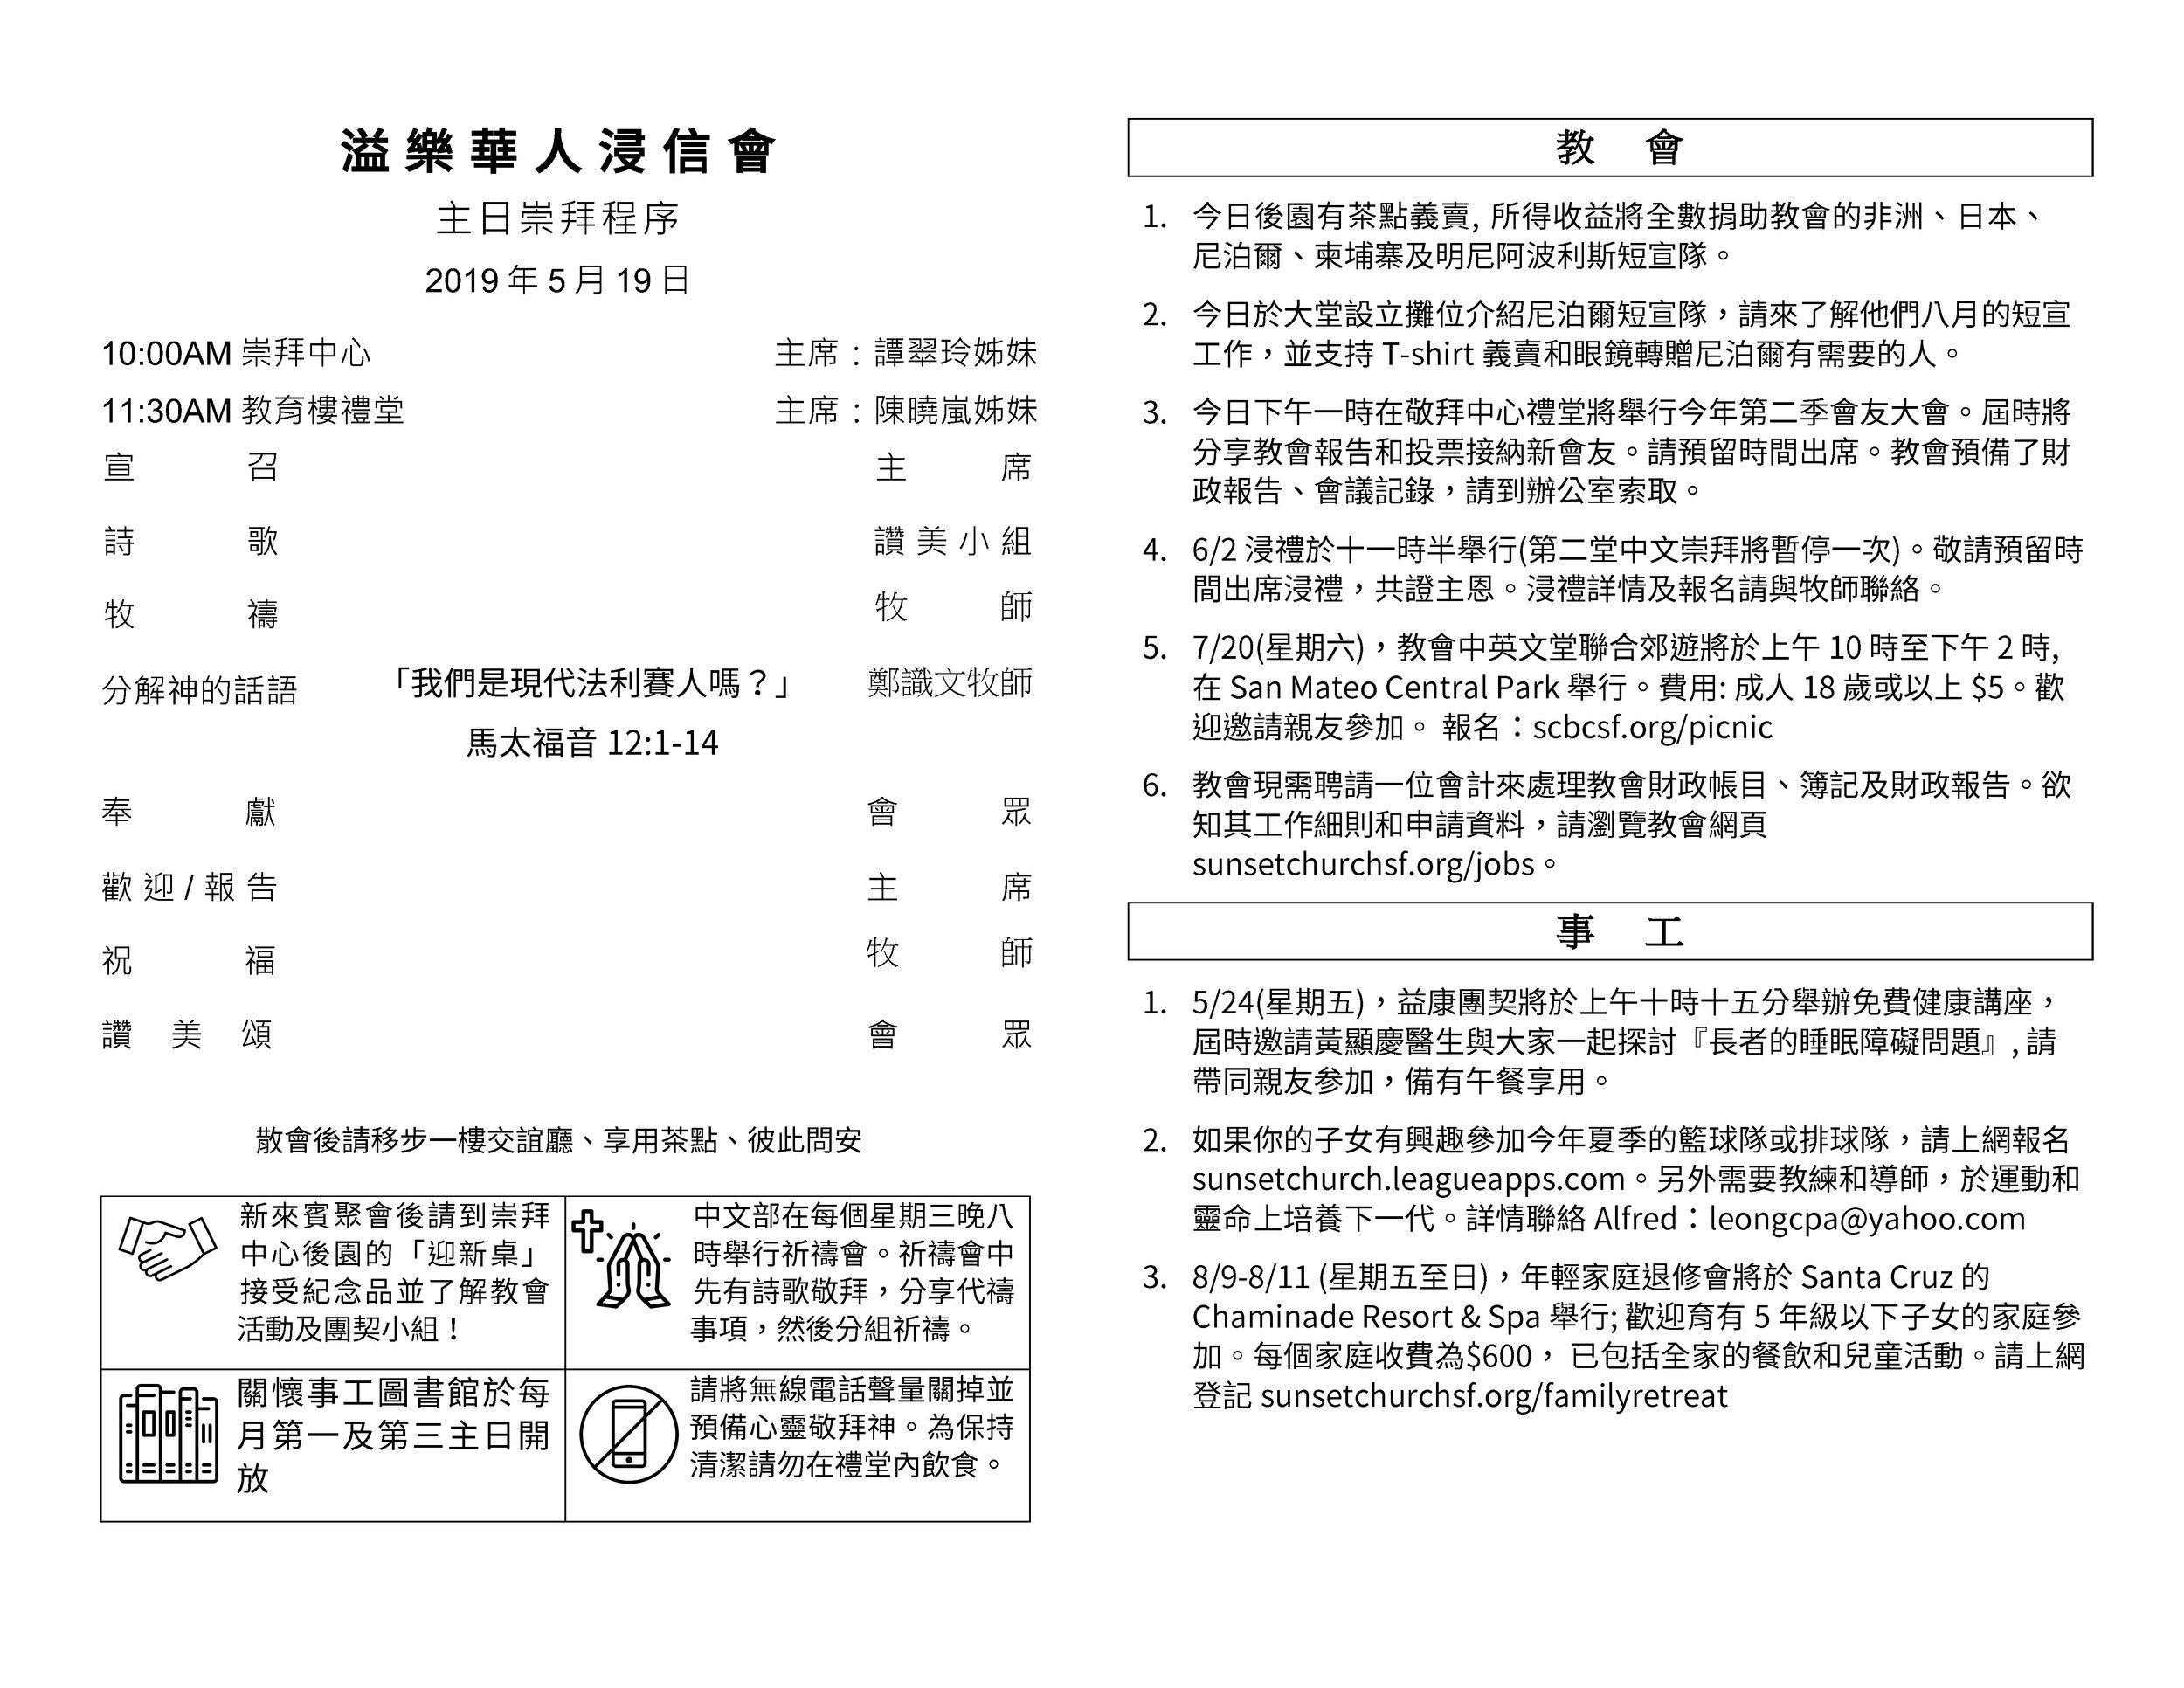 Chinese Bulletin 2019-5-19_Page_2.jpg